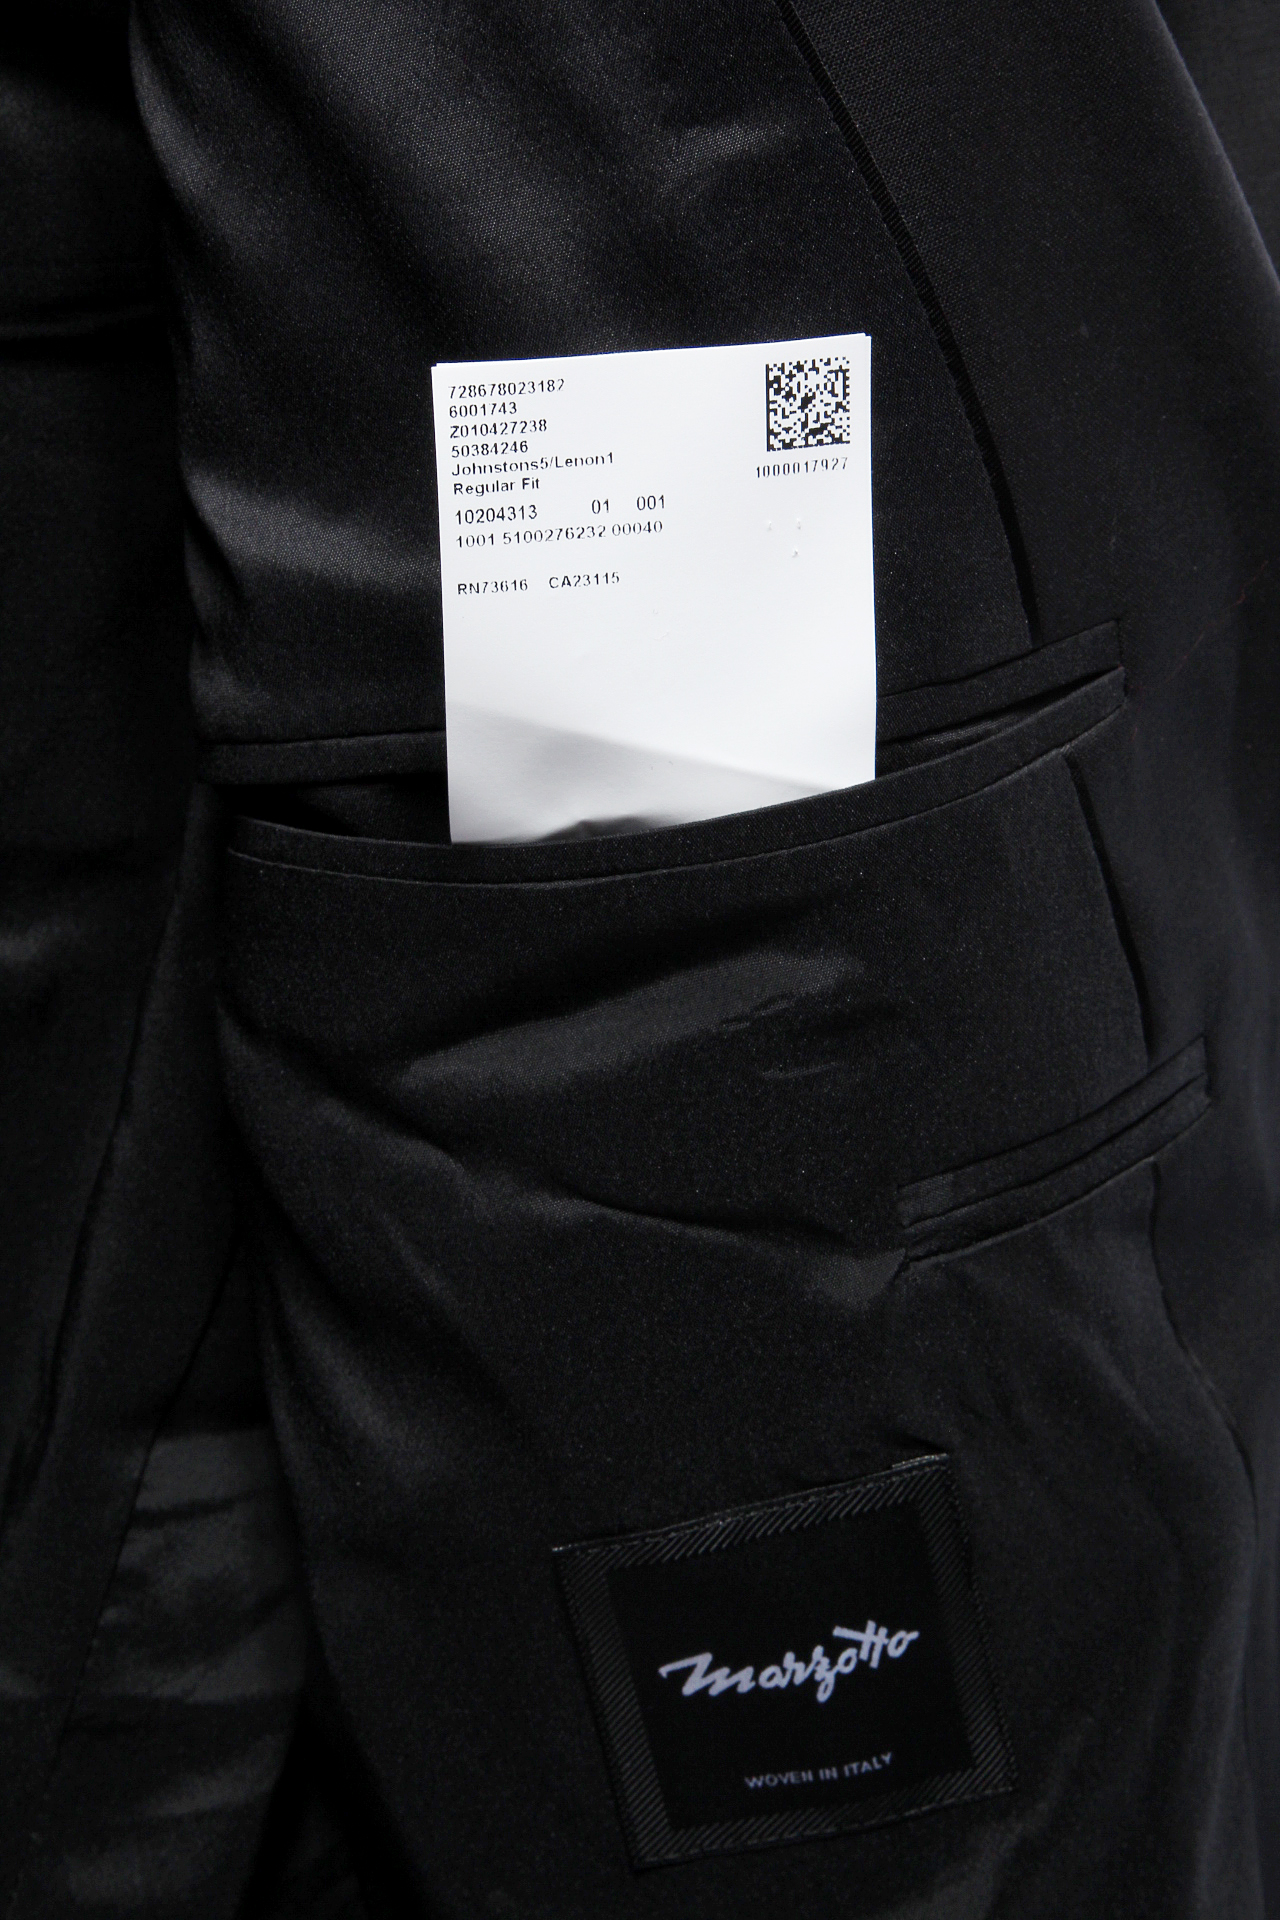 toller Wert Original- laest technology Details about HUGO BOSS $895 NEW Mens 3116 Johnstons5/Lenon1 Jacket Blazer  40R